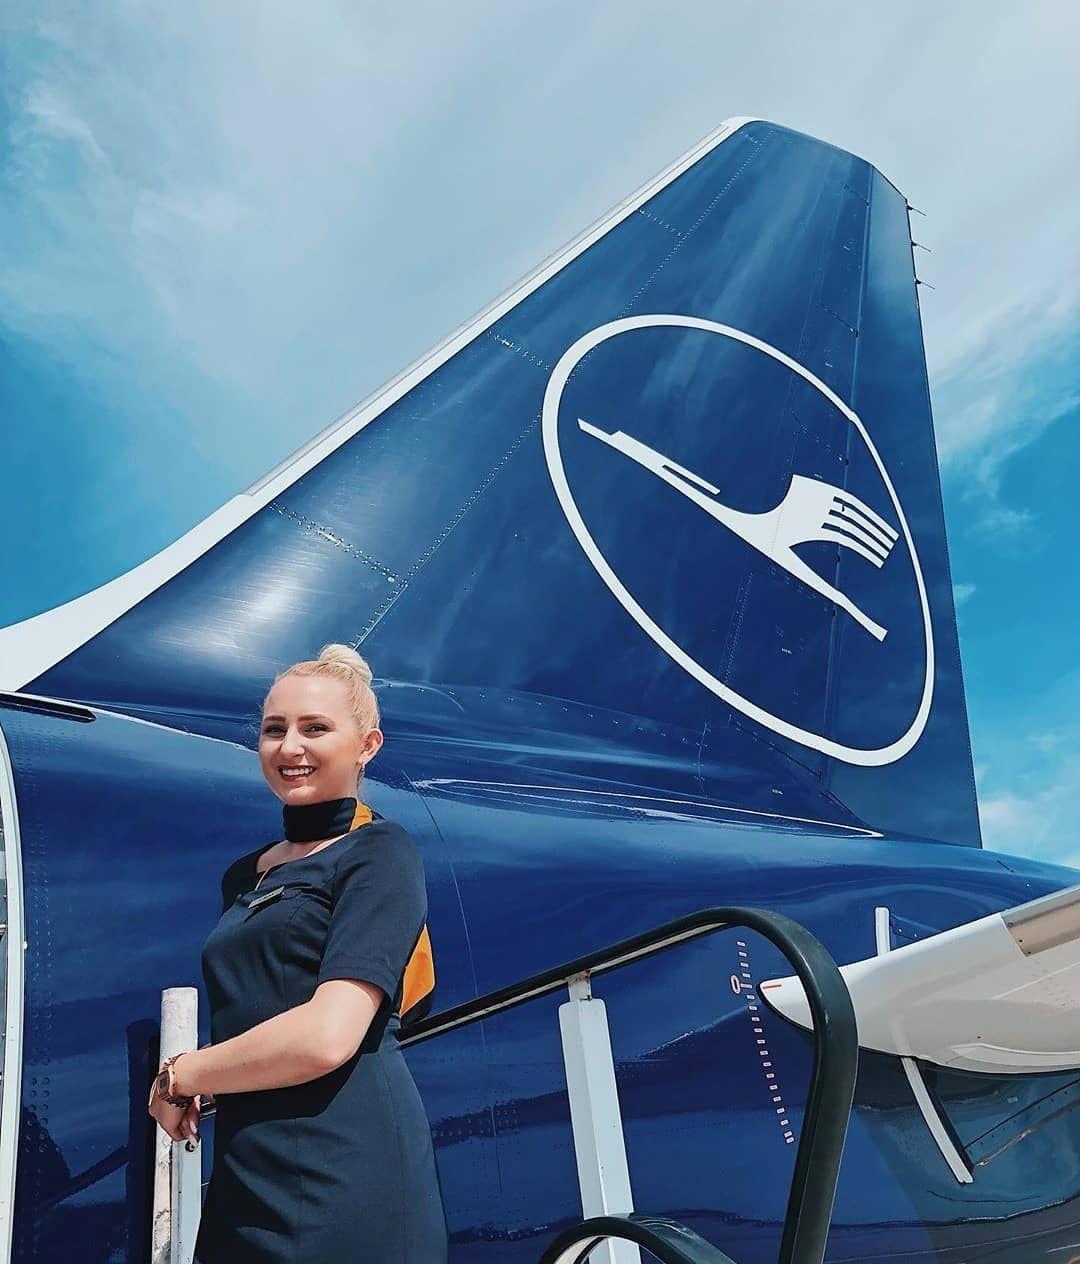 New logo Lufthansa and stewardess. aircraft